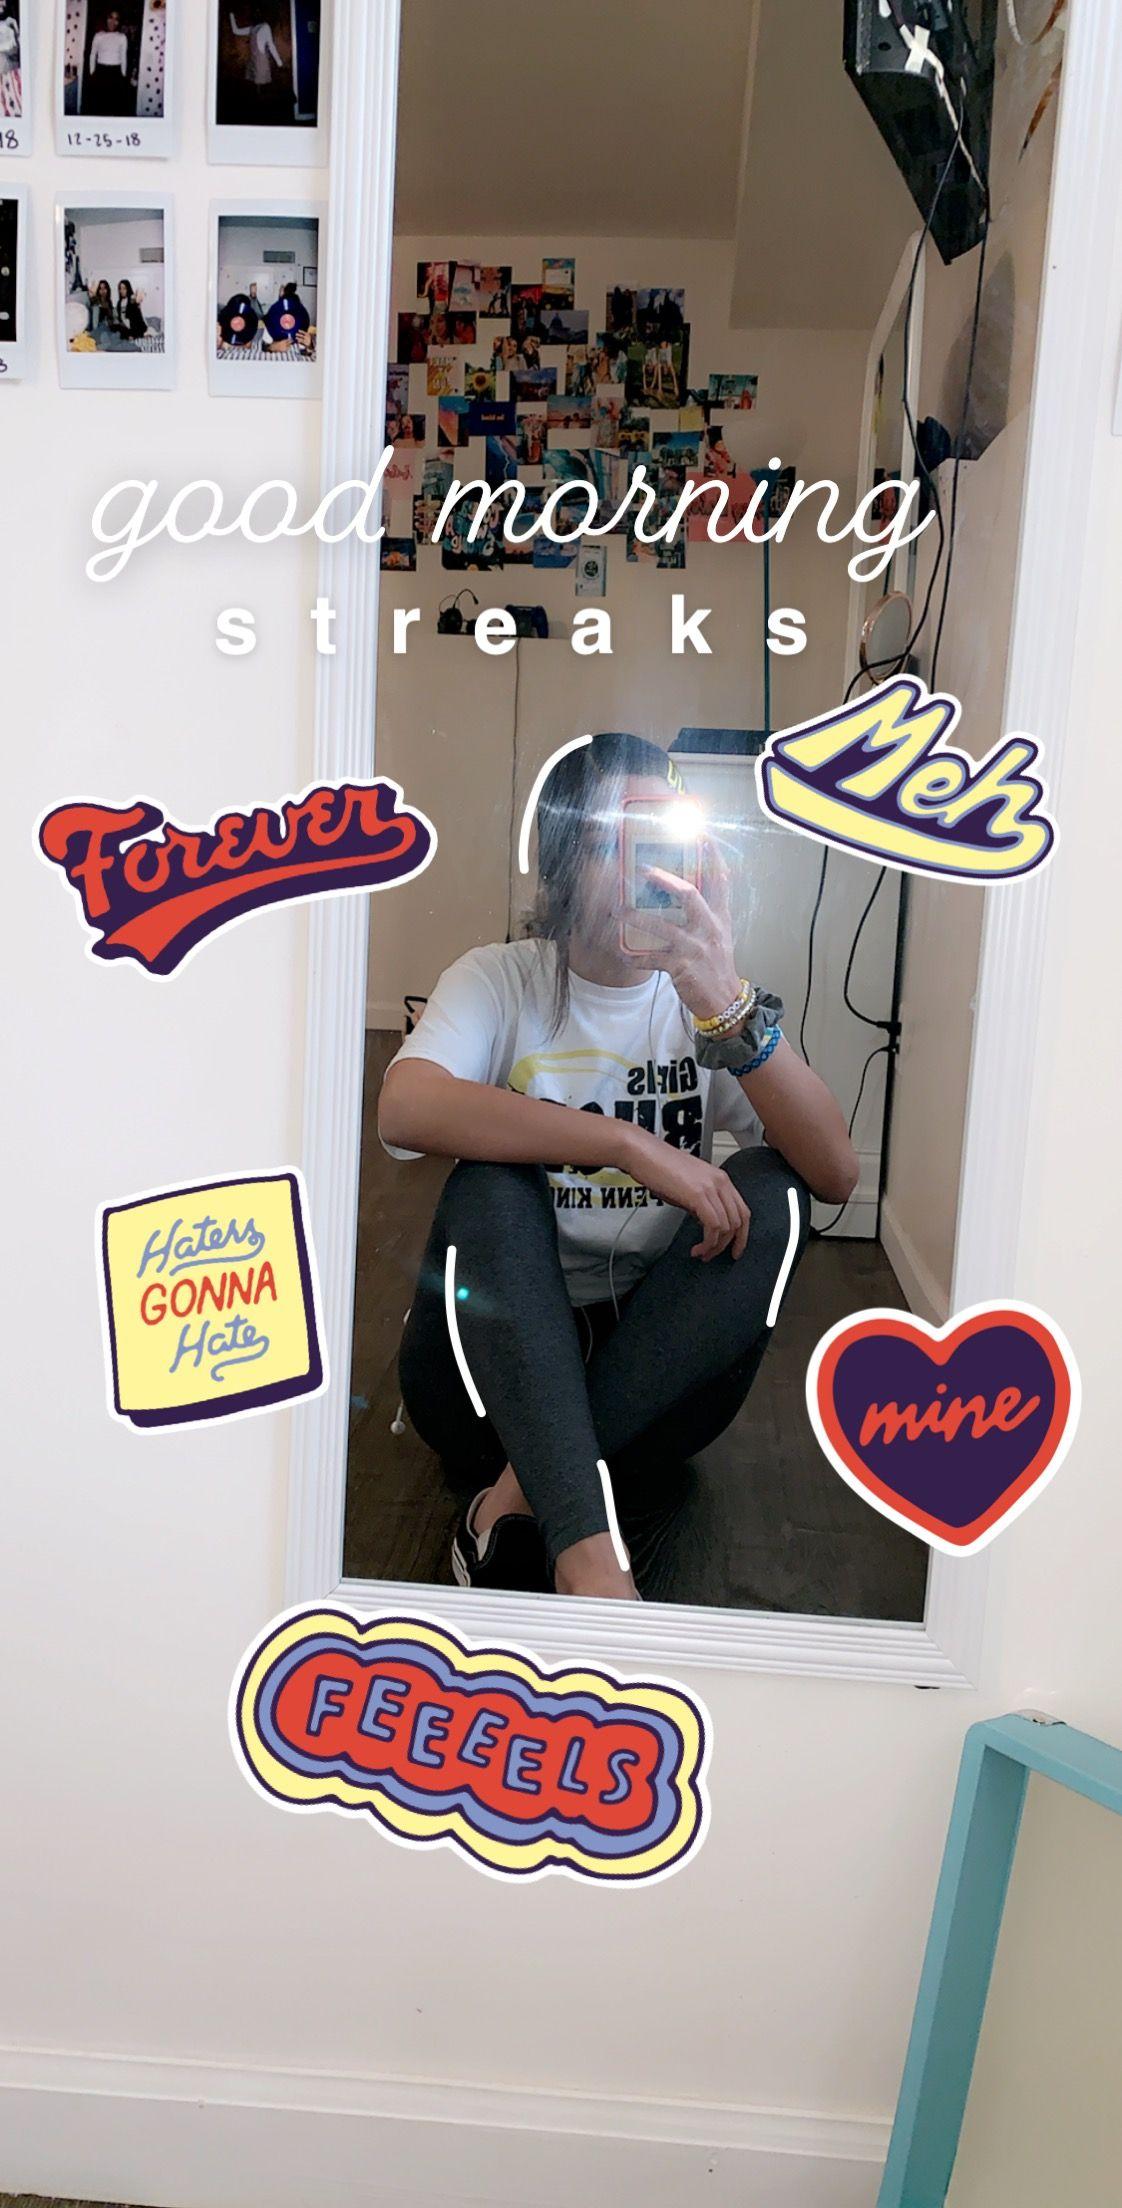 morning #goodmorning #streaks #snapchat #mirrorselfie   m e